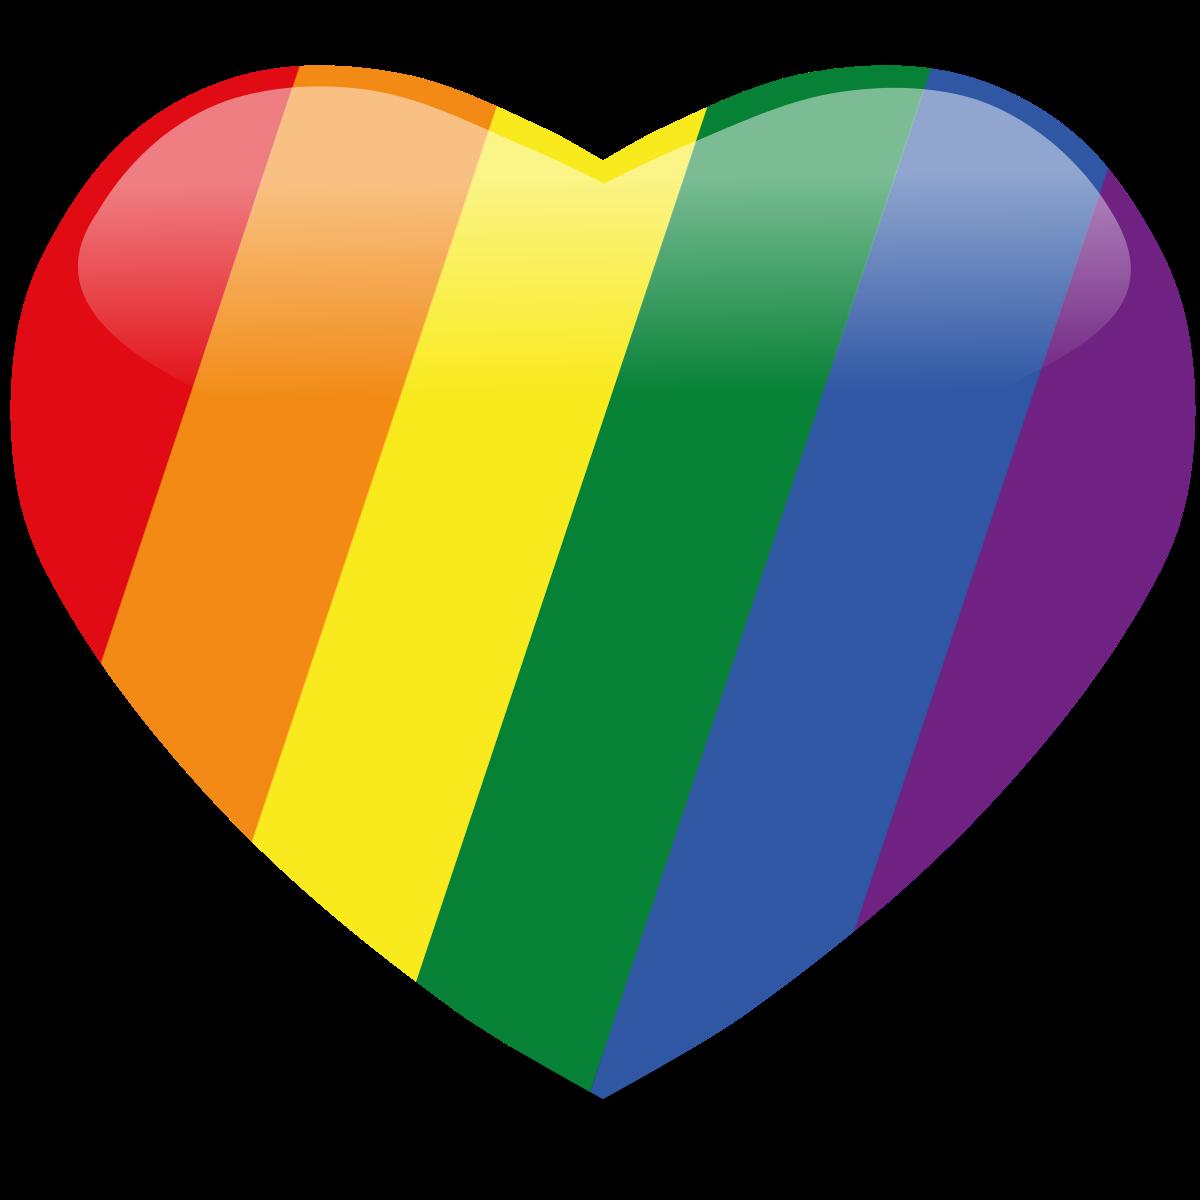 Waffle clipart heart. Rainbow show me the